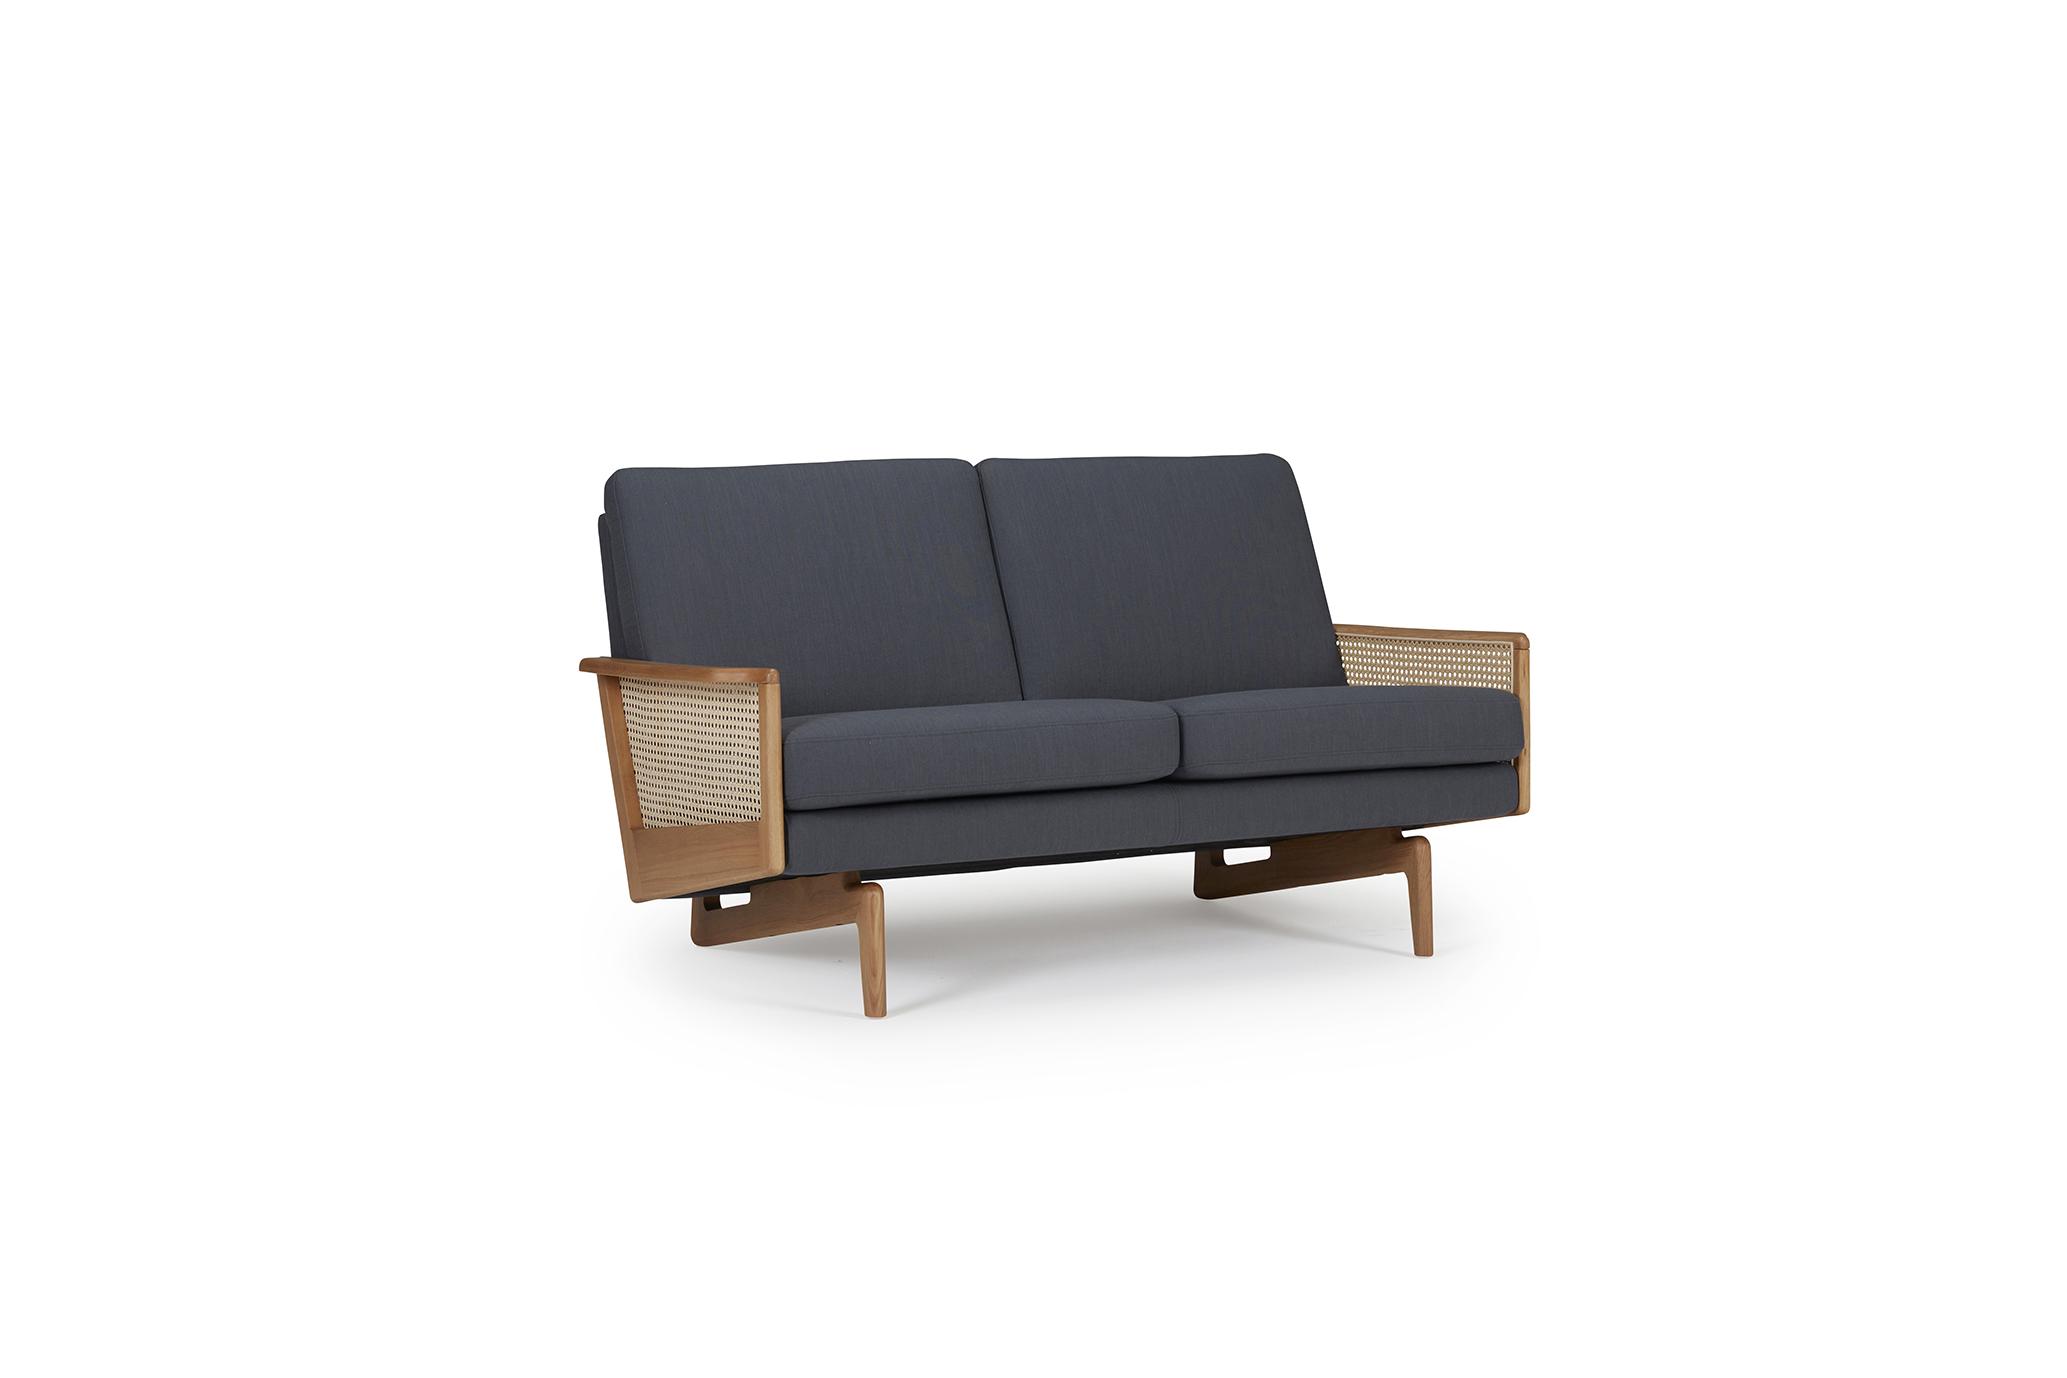 egsmark-sofa-cane-web-oliver-lukas-weisskrogh-1.jpg